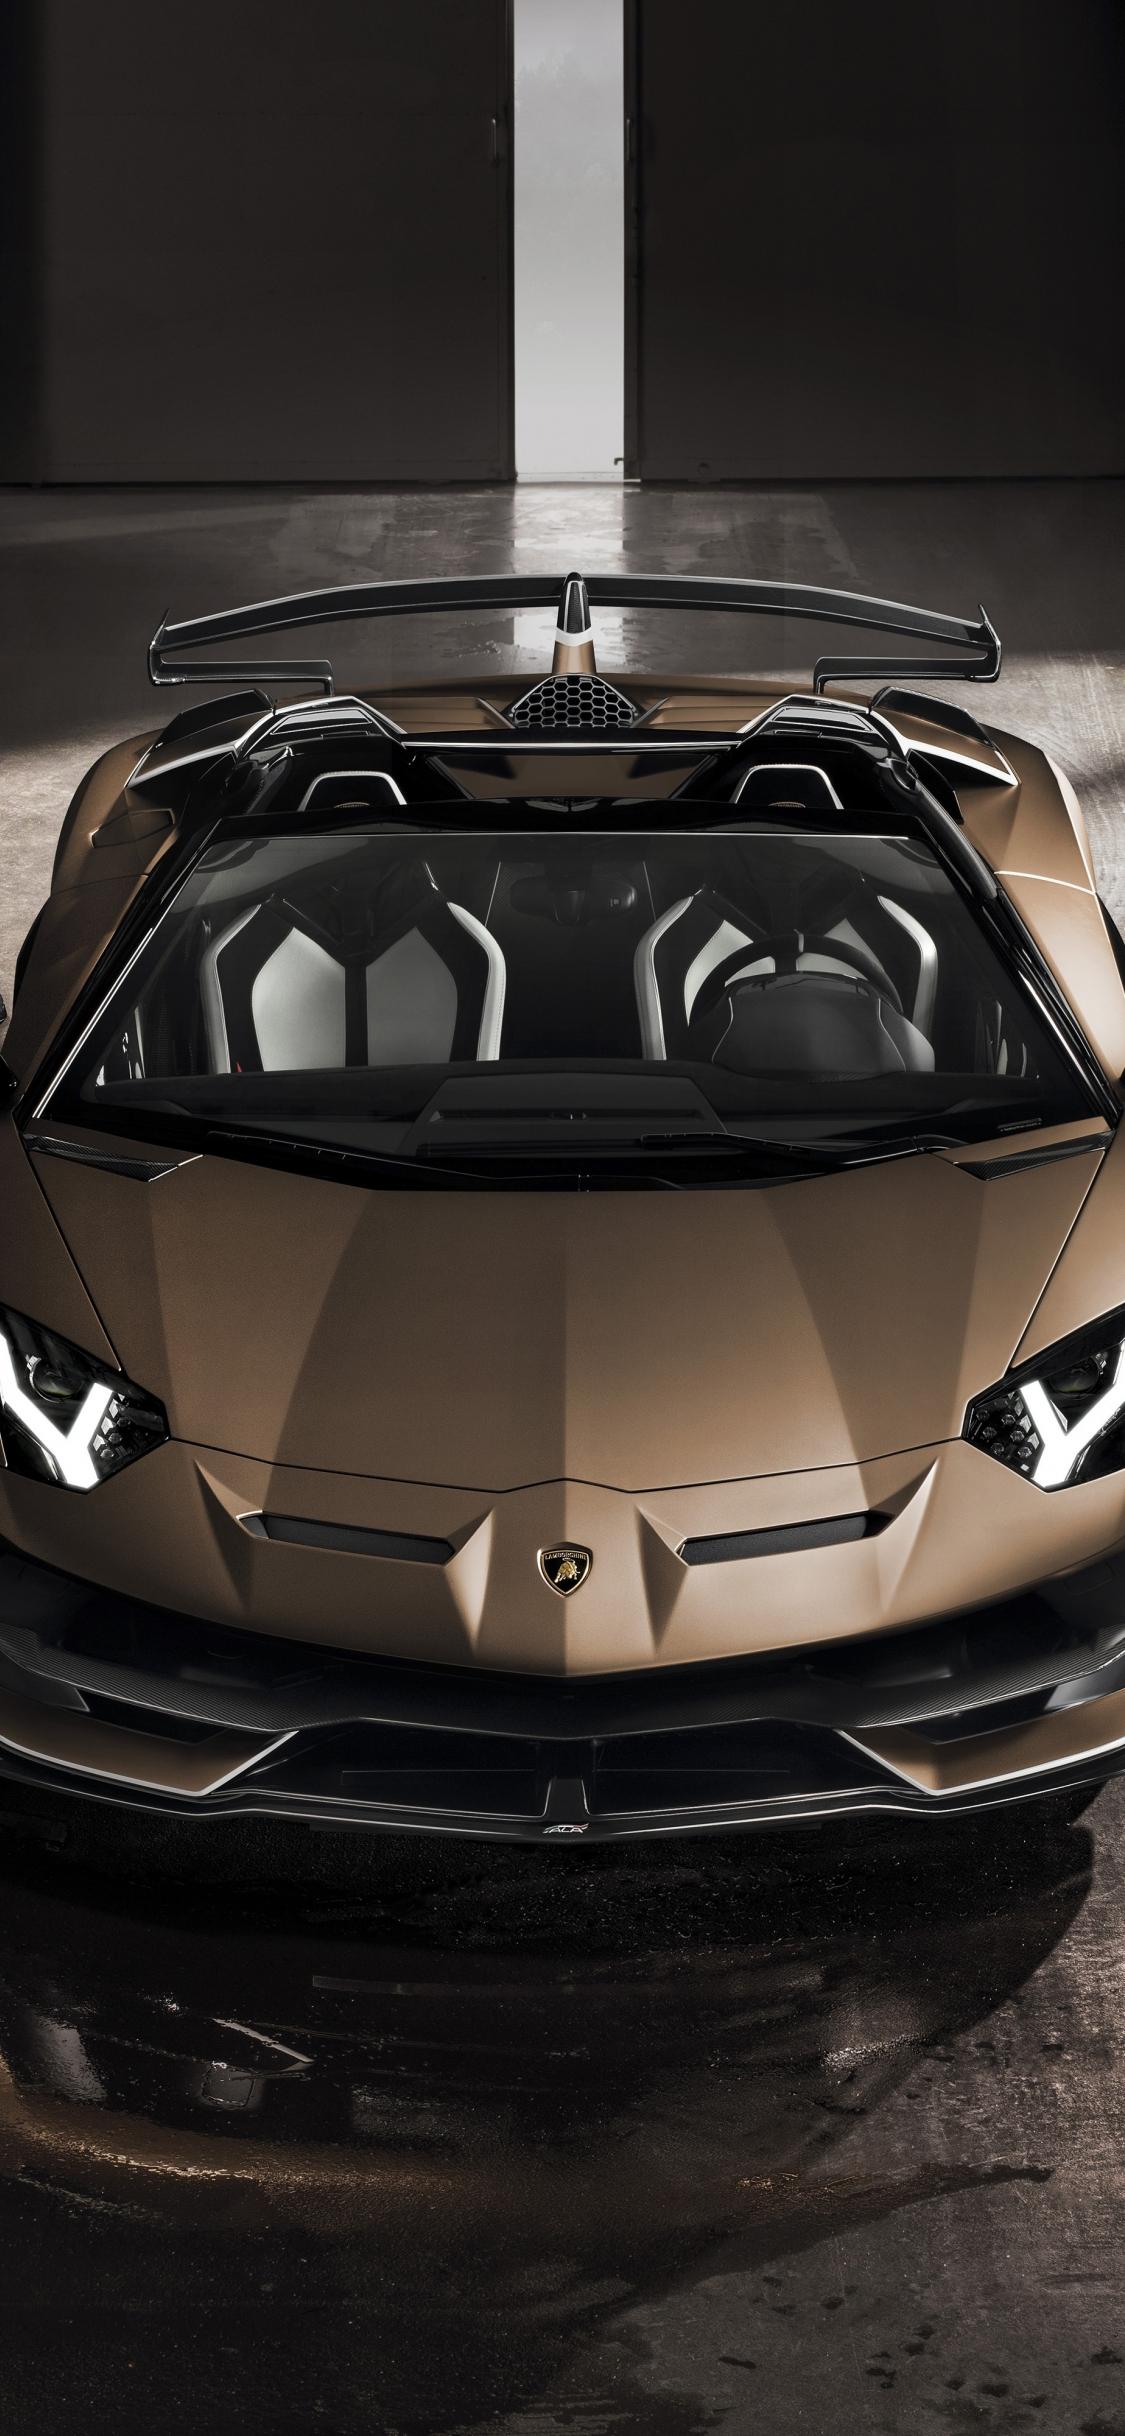 Download 1125x2436 Wallpaper Lamborghini Aventador Svj